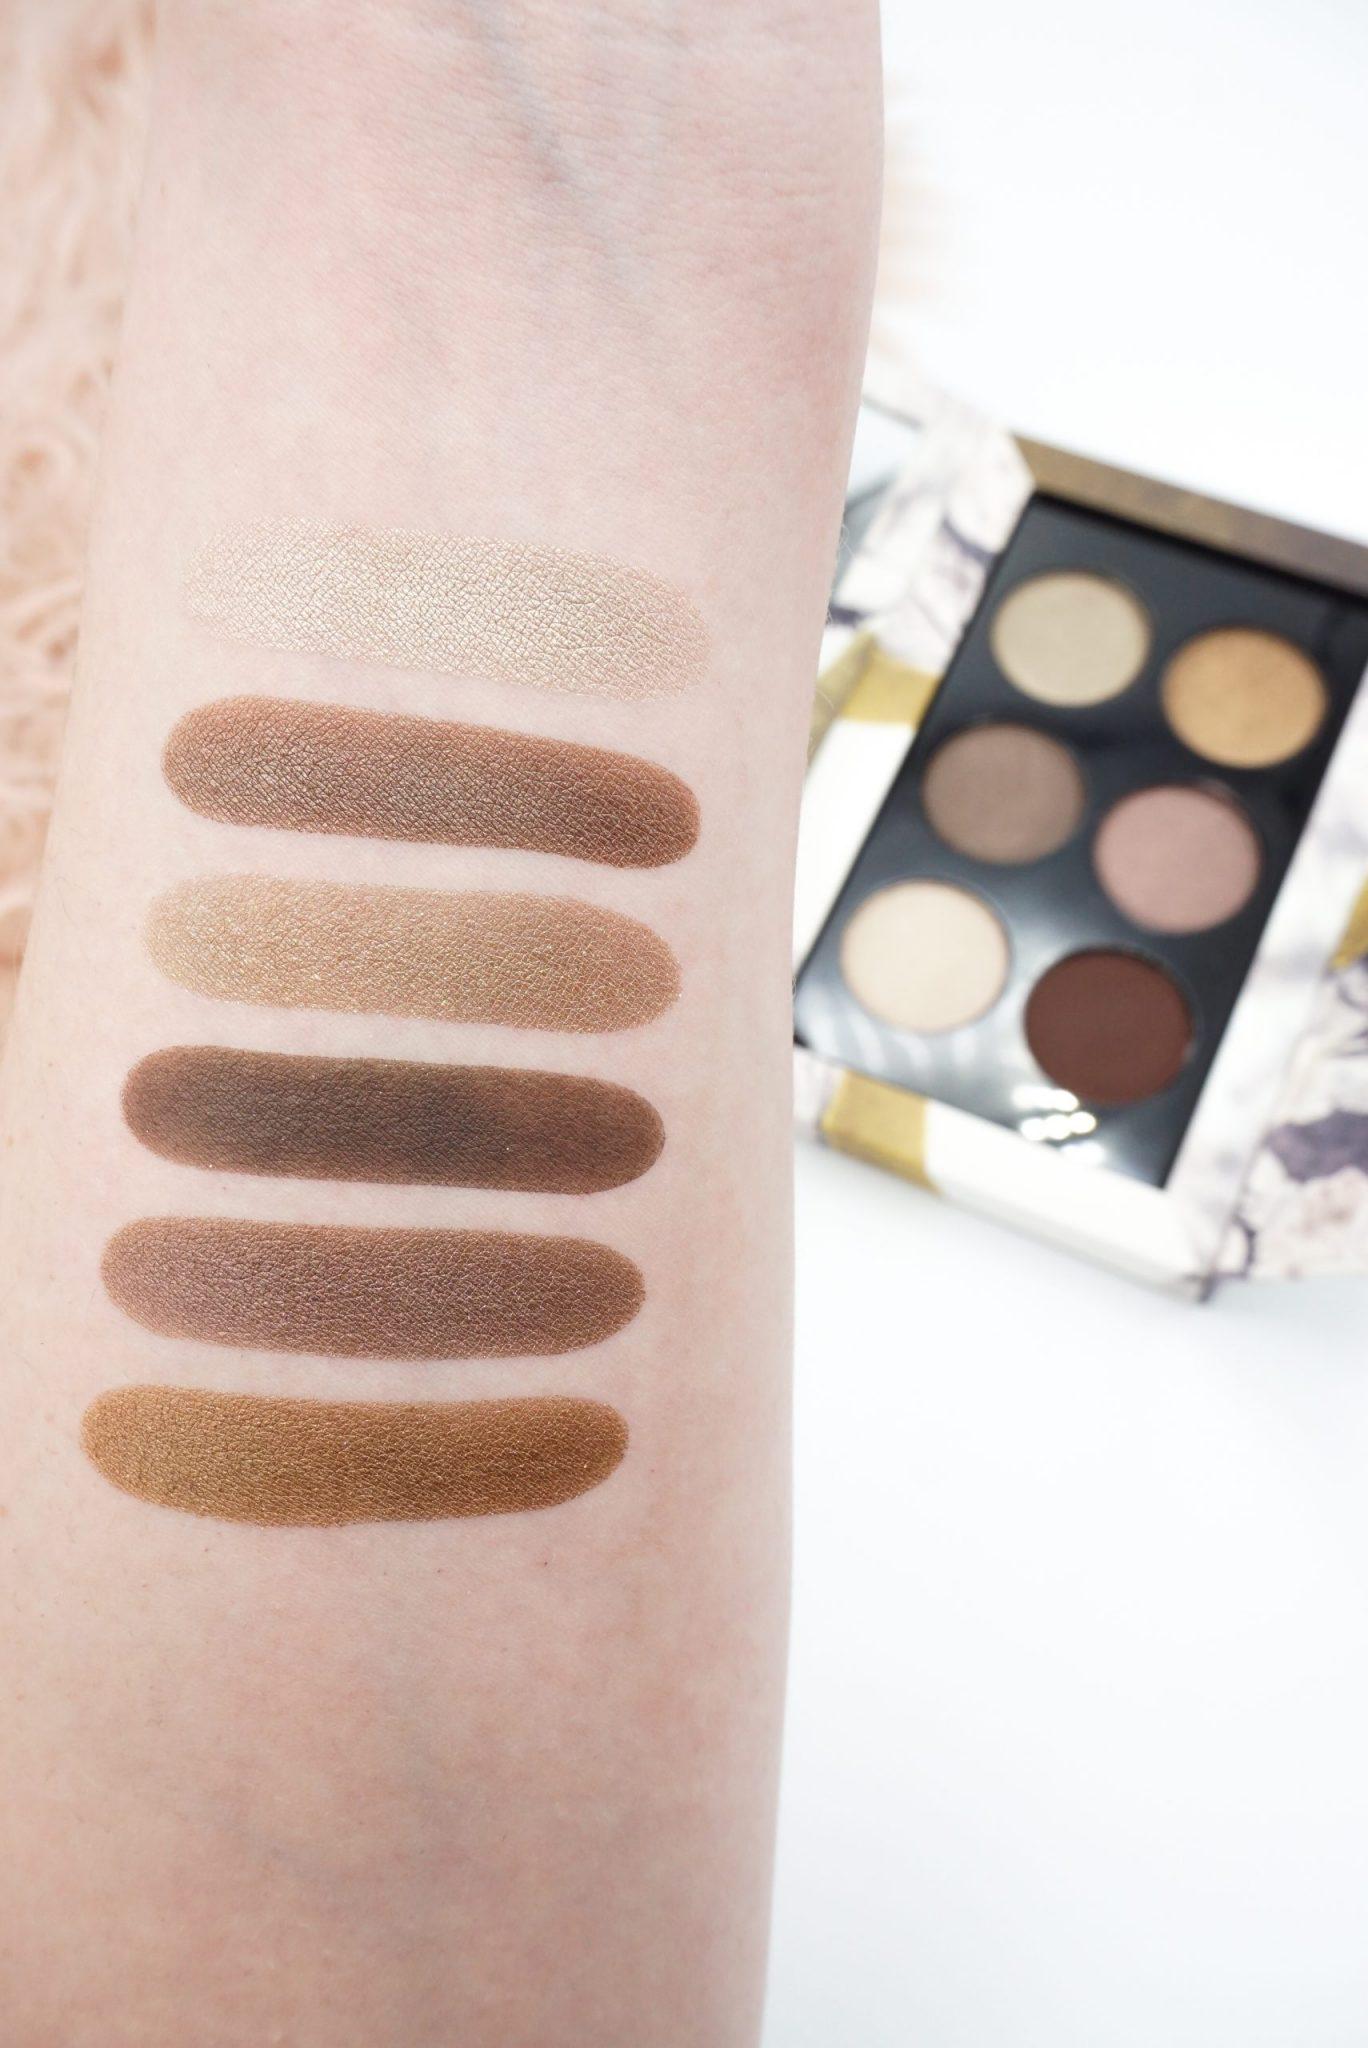 Pat McGrath Labs Subliminal Platinum Bronze 6 Pan Eyeshadow Palette Review ⋆ Beautymone